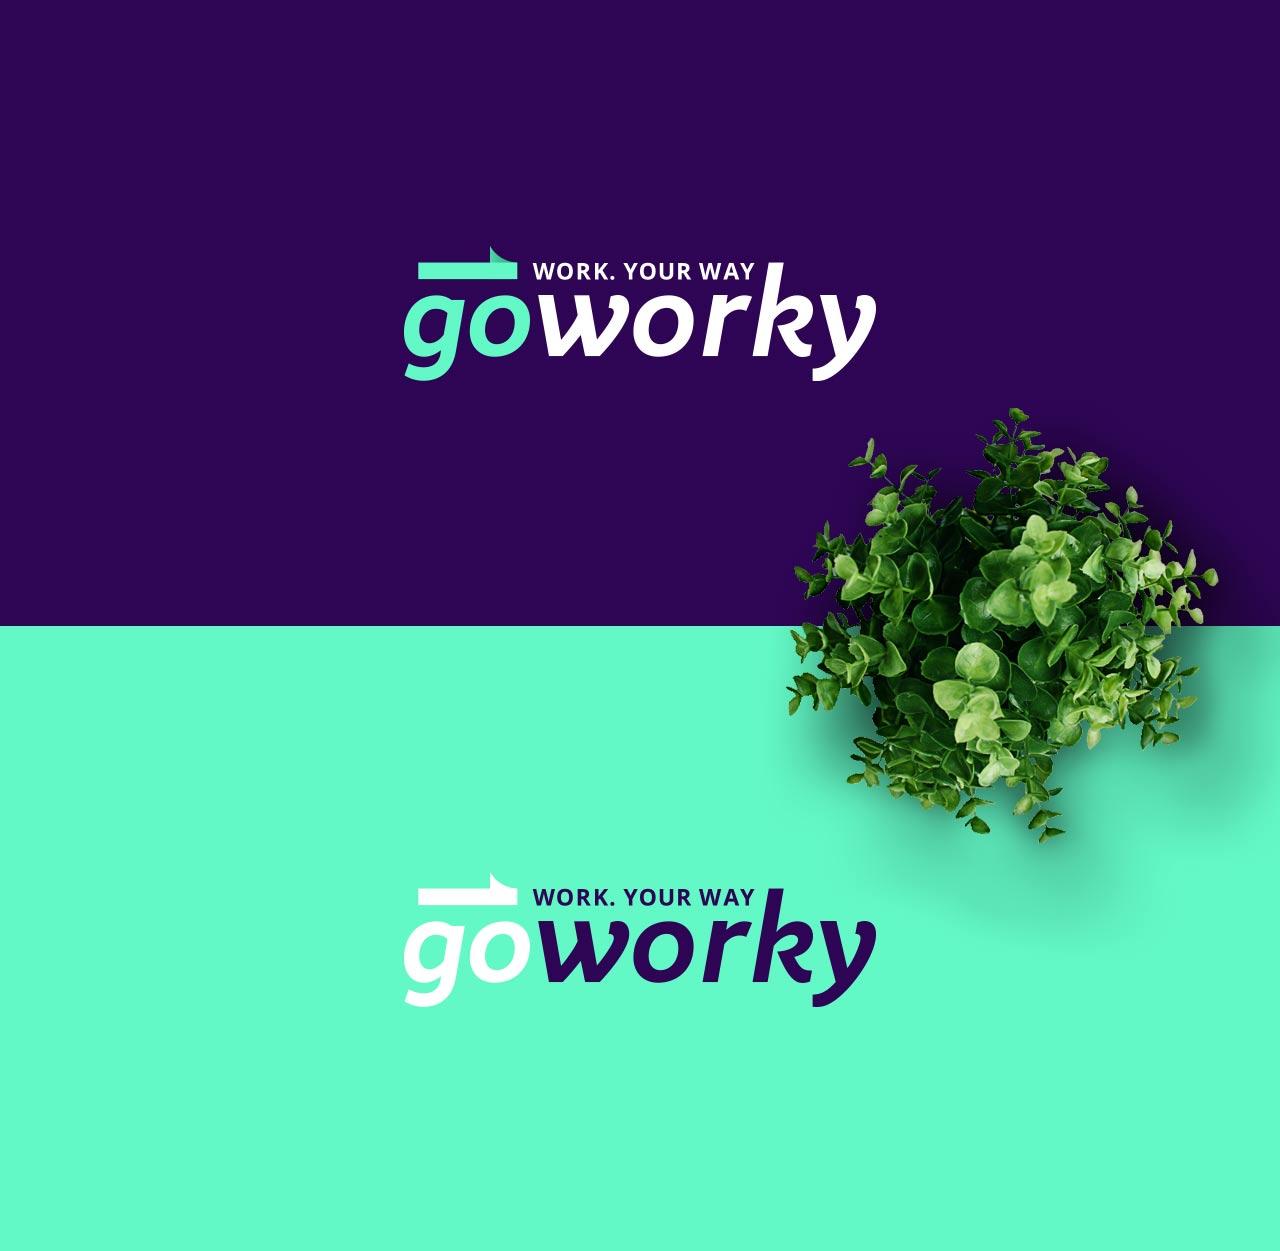 goworky logo brand grafico milano 1